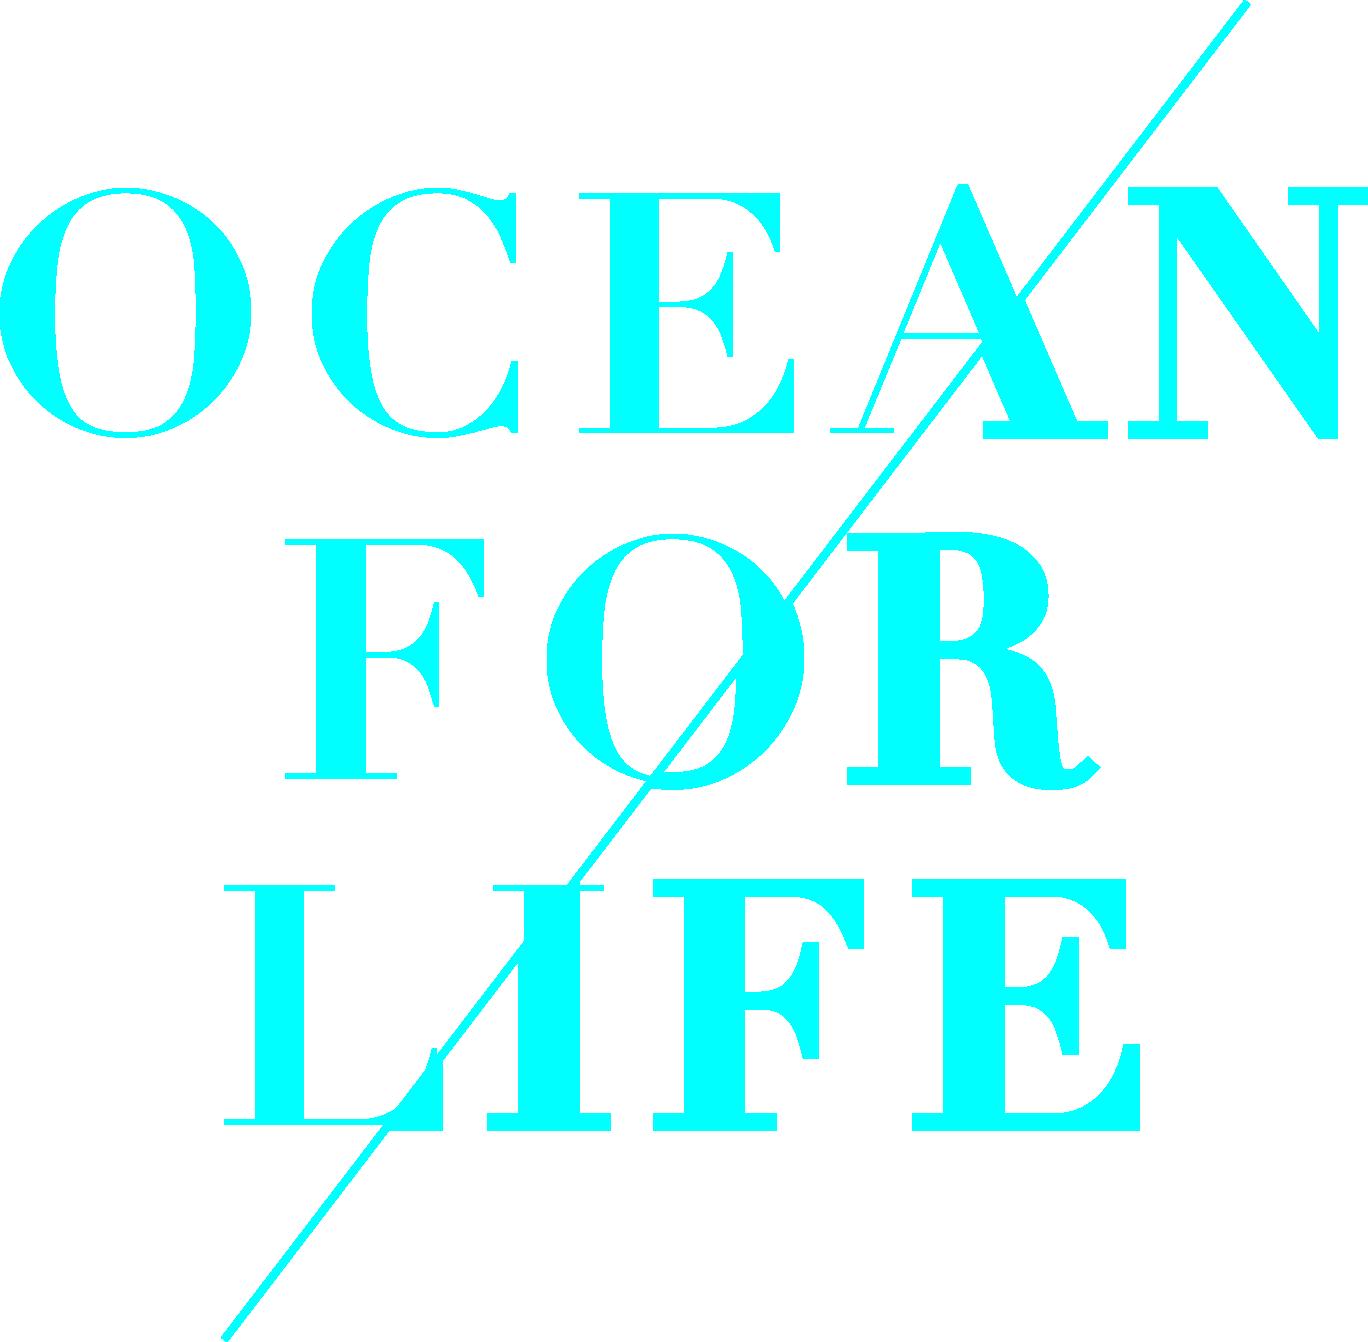 Ocean for life